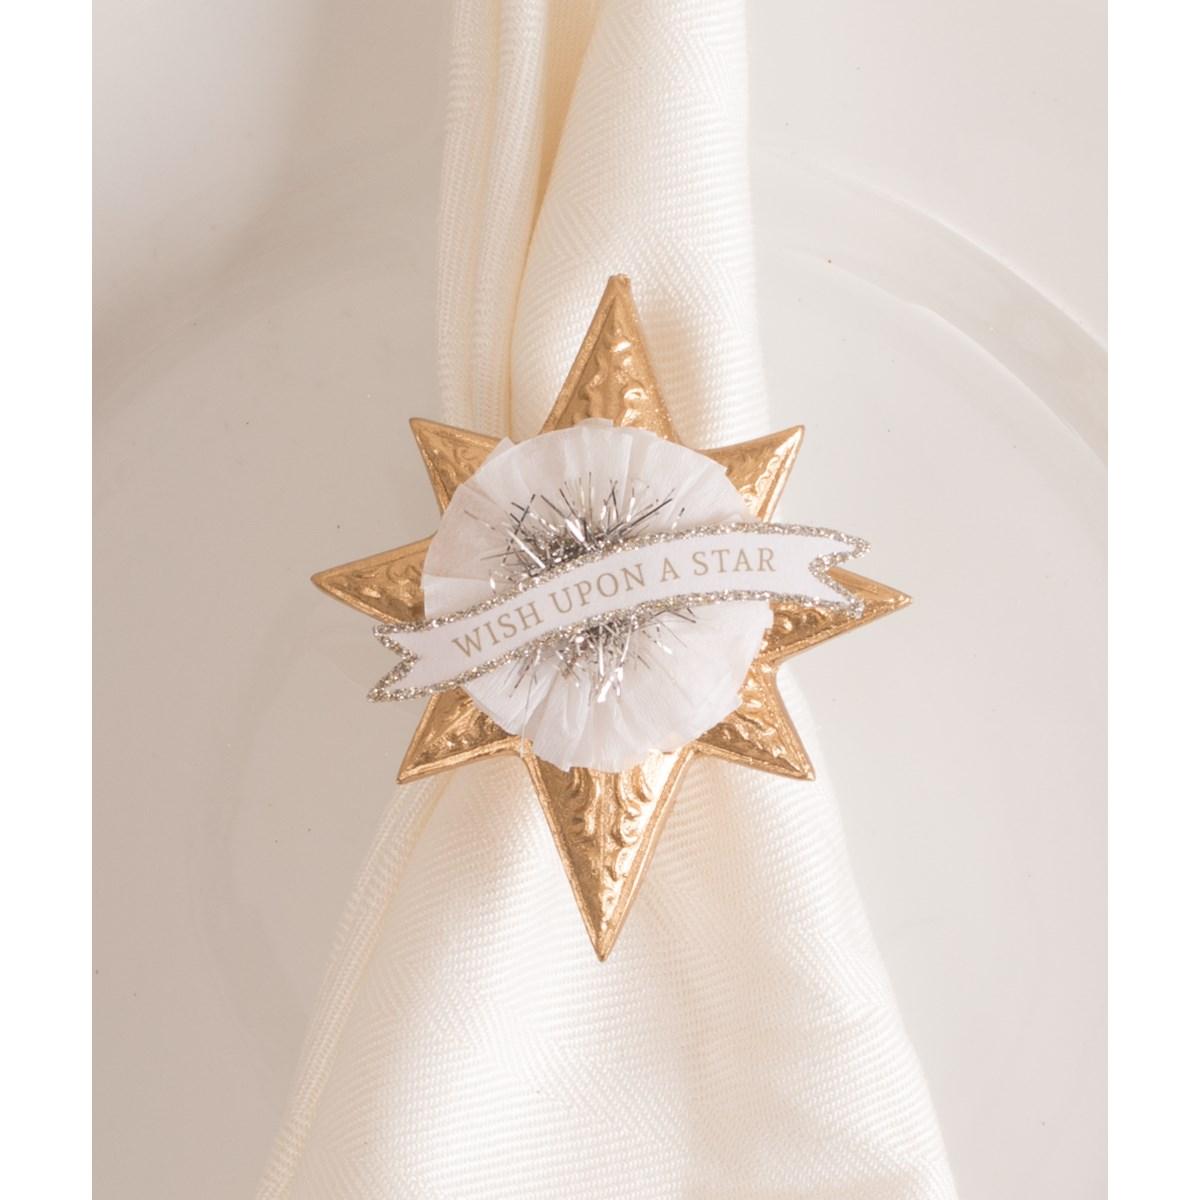 Wish Upon a Star Napkin Ring